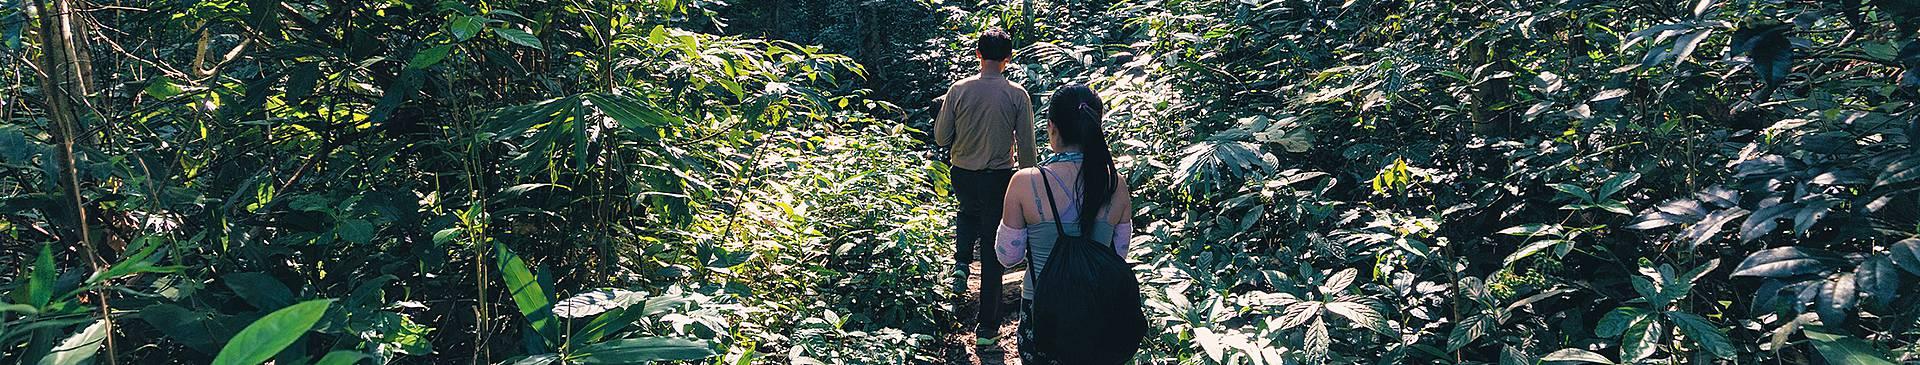 Vietnam jungle tours